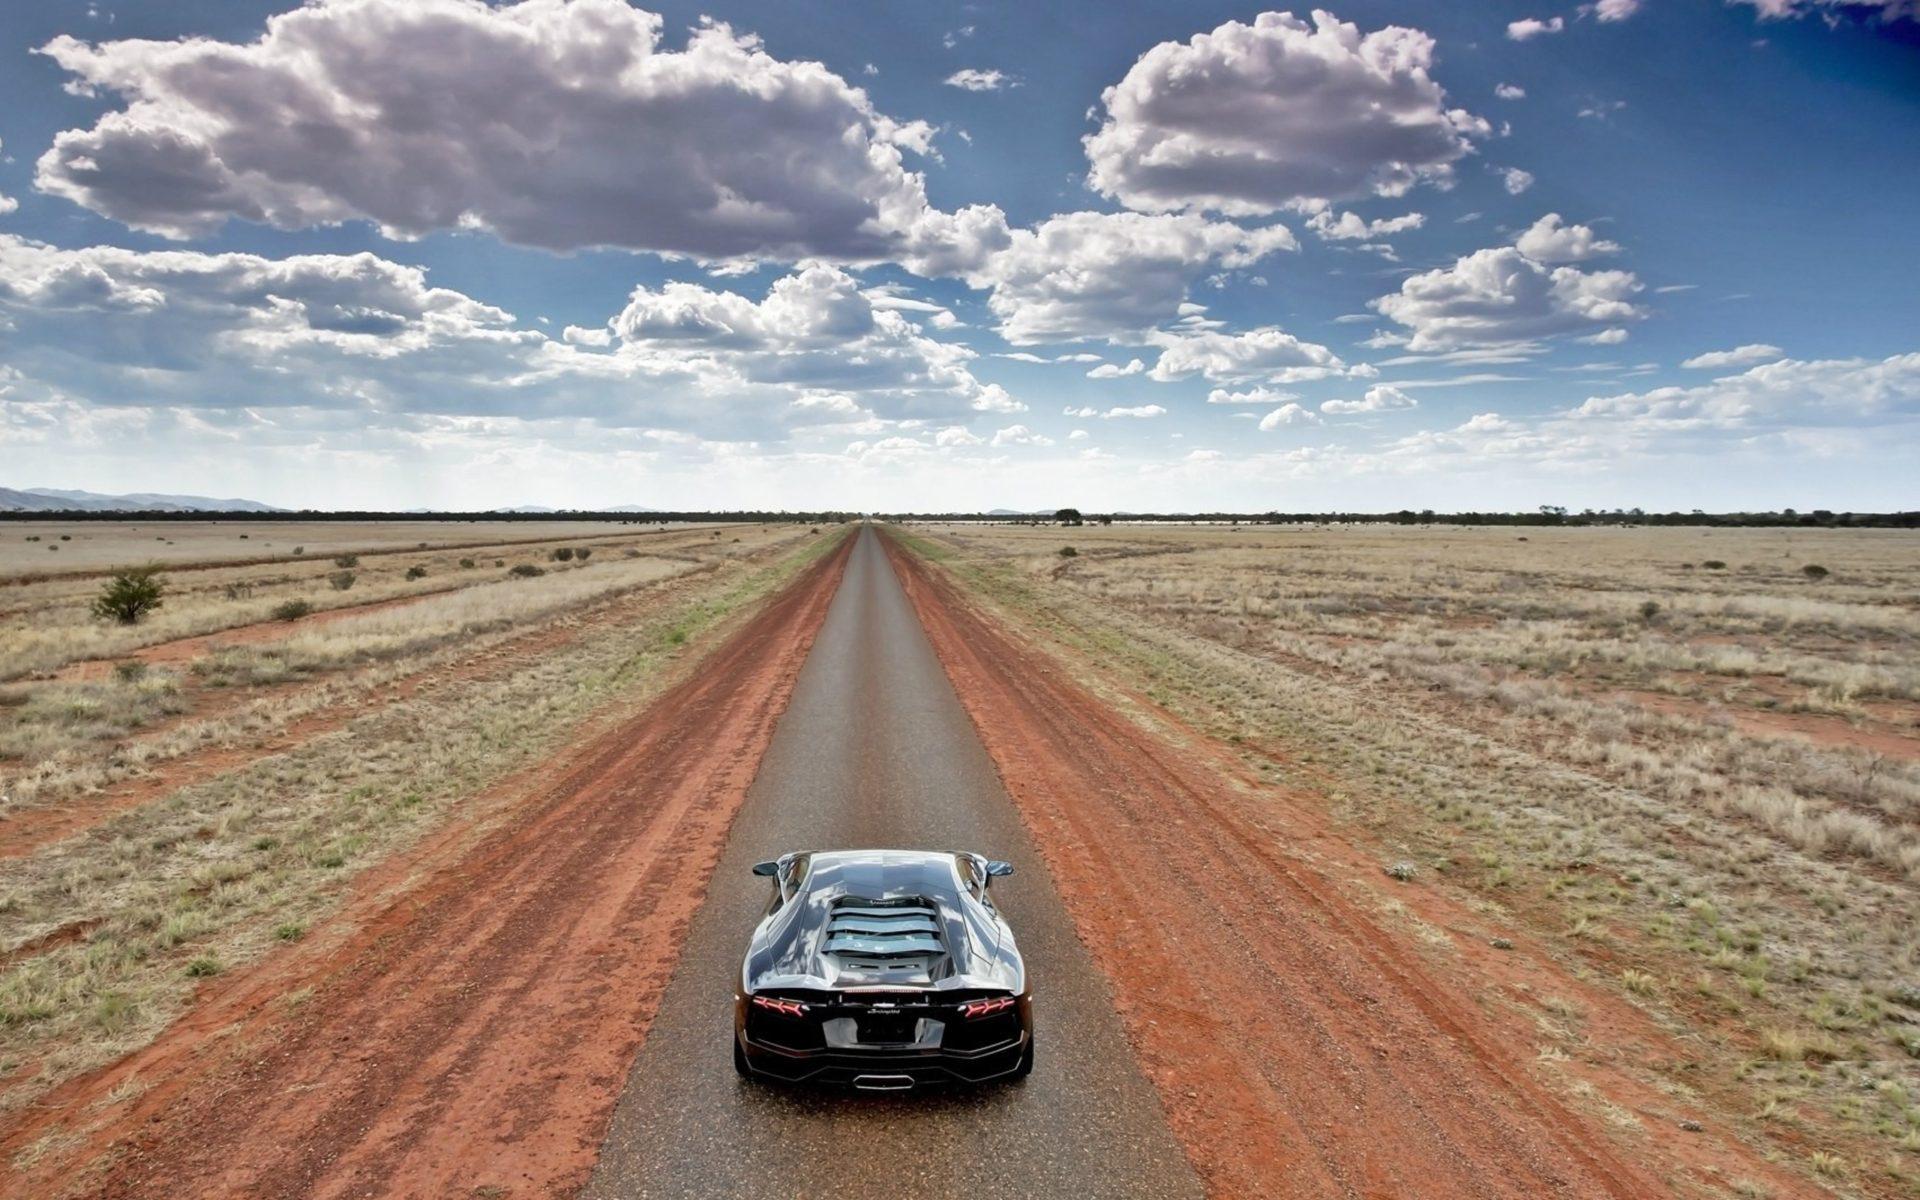 Windows D Wallpaper Lamborghini Aventador On Empty Country Road Wide